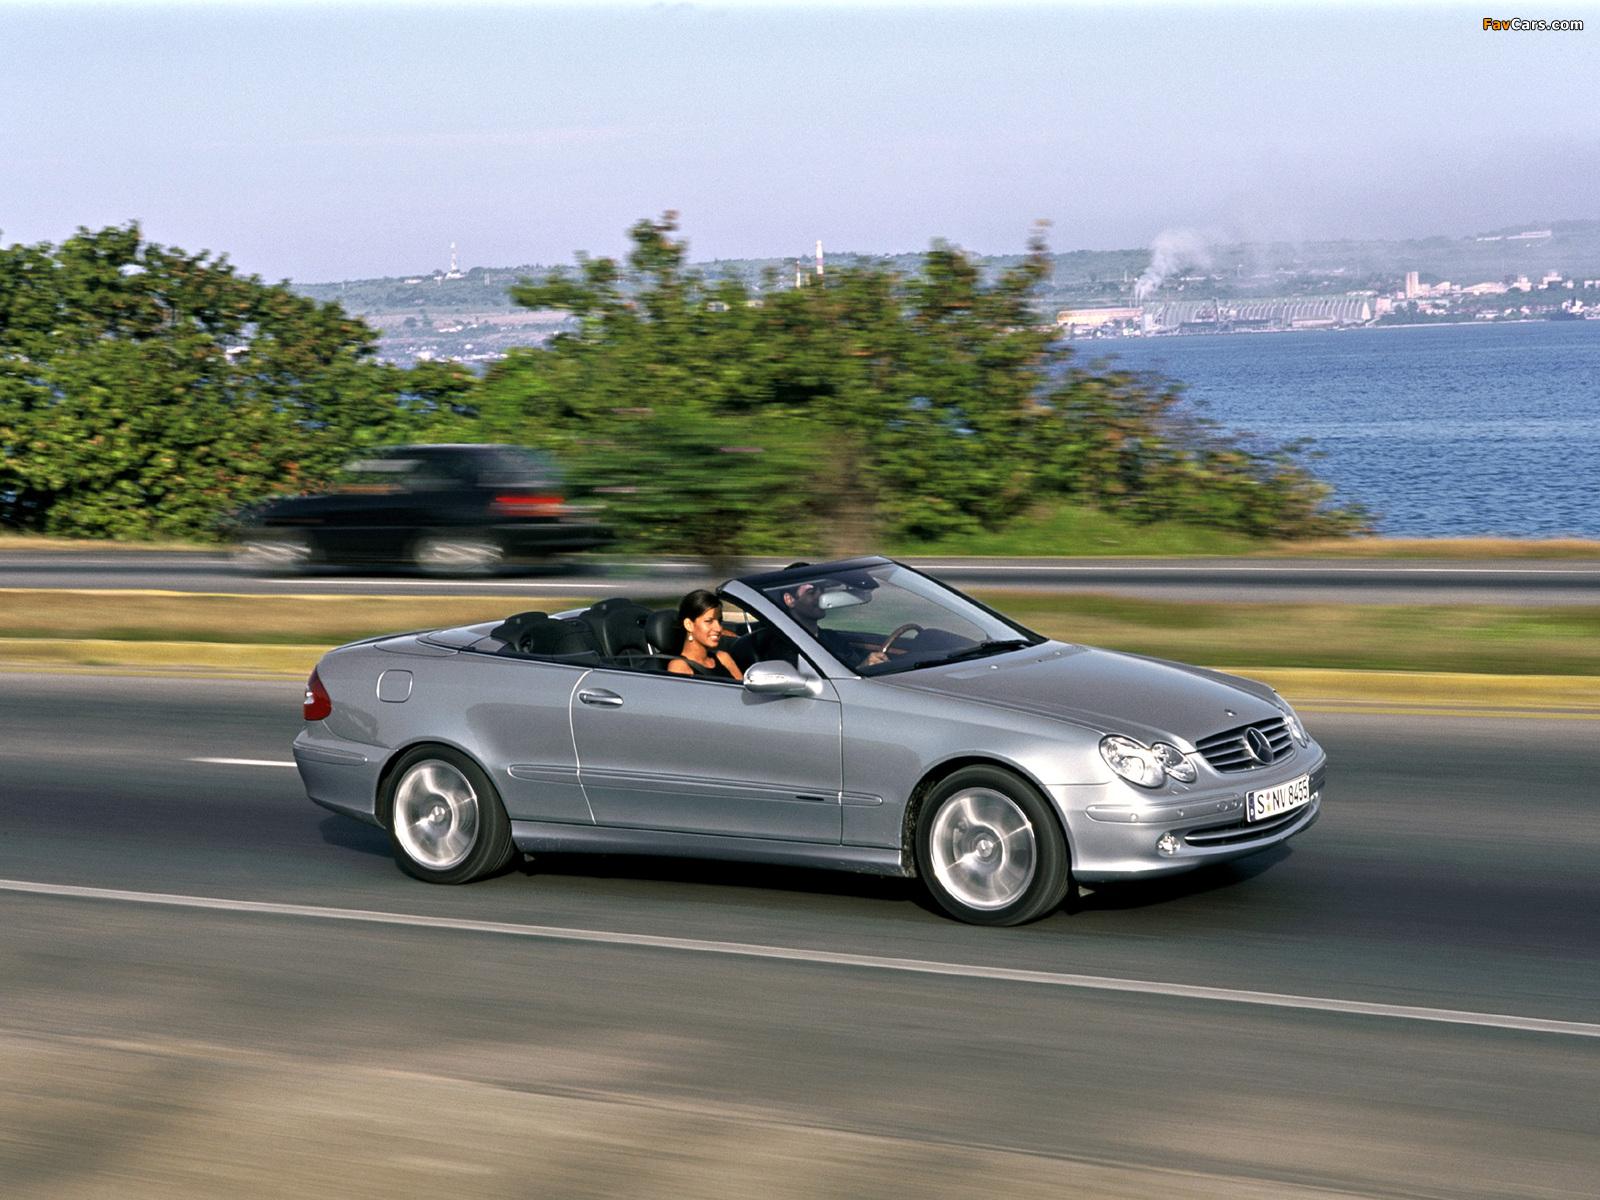 Pictures of mercedes benz clk 240 cabrio a209 2003 05 for Mercedes benz clk 240